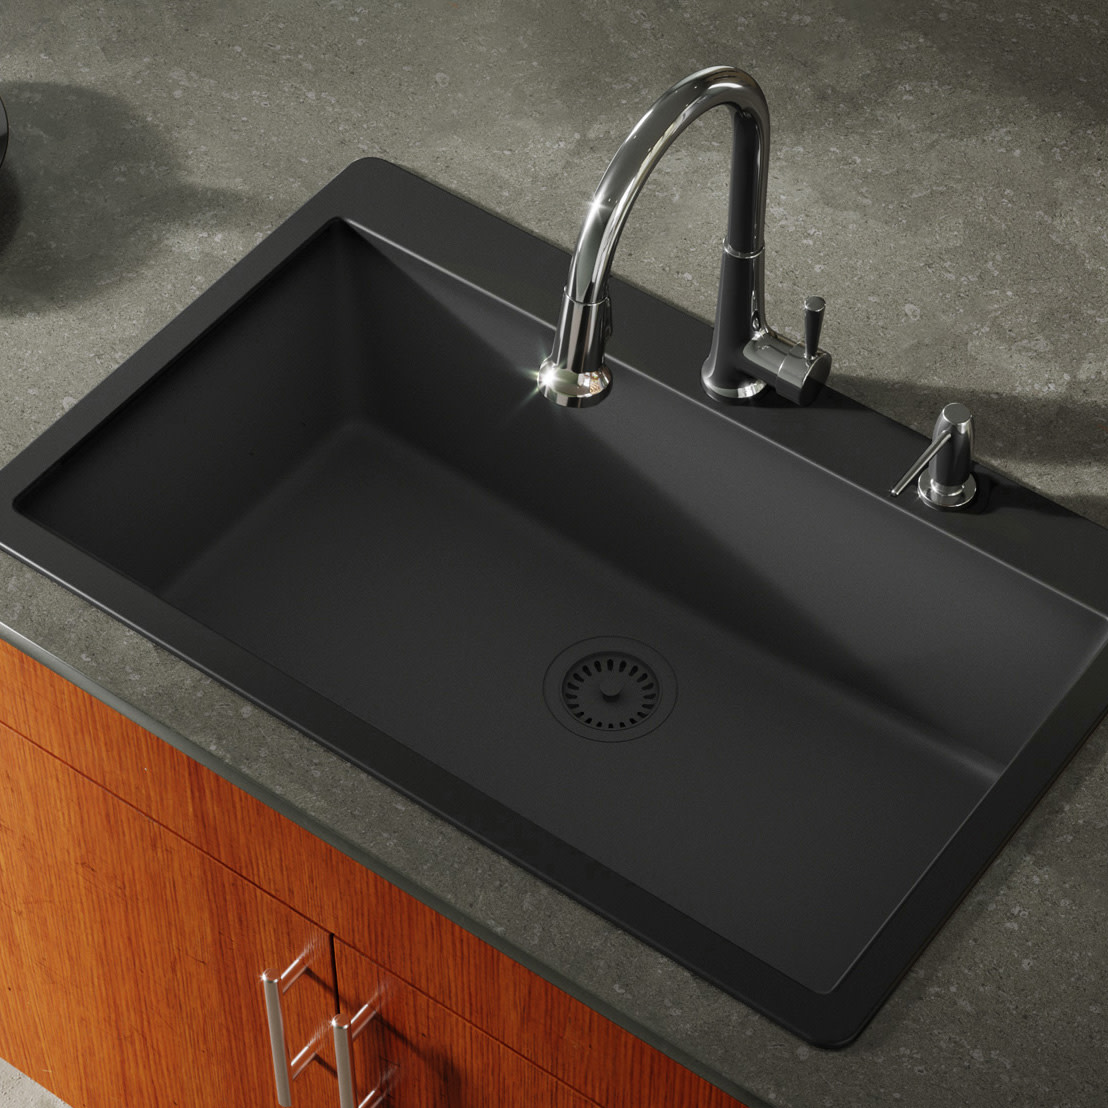 Miseno Mg3321t Carolina 33 Single Basin Drop In Stone Composite Kitchen Sink Walmart Com Walmart Com